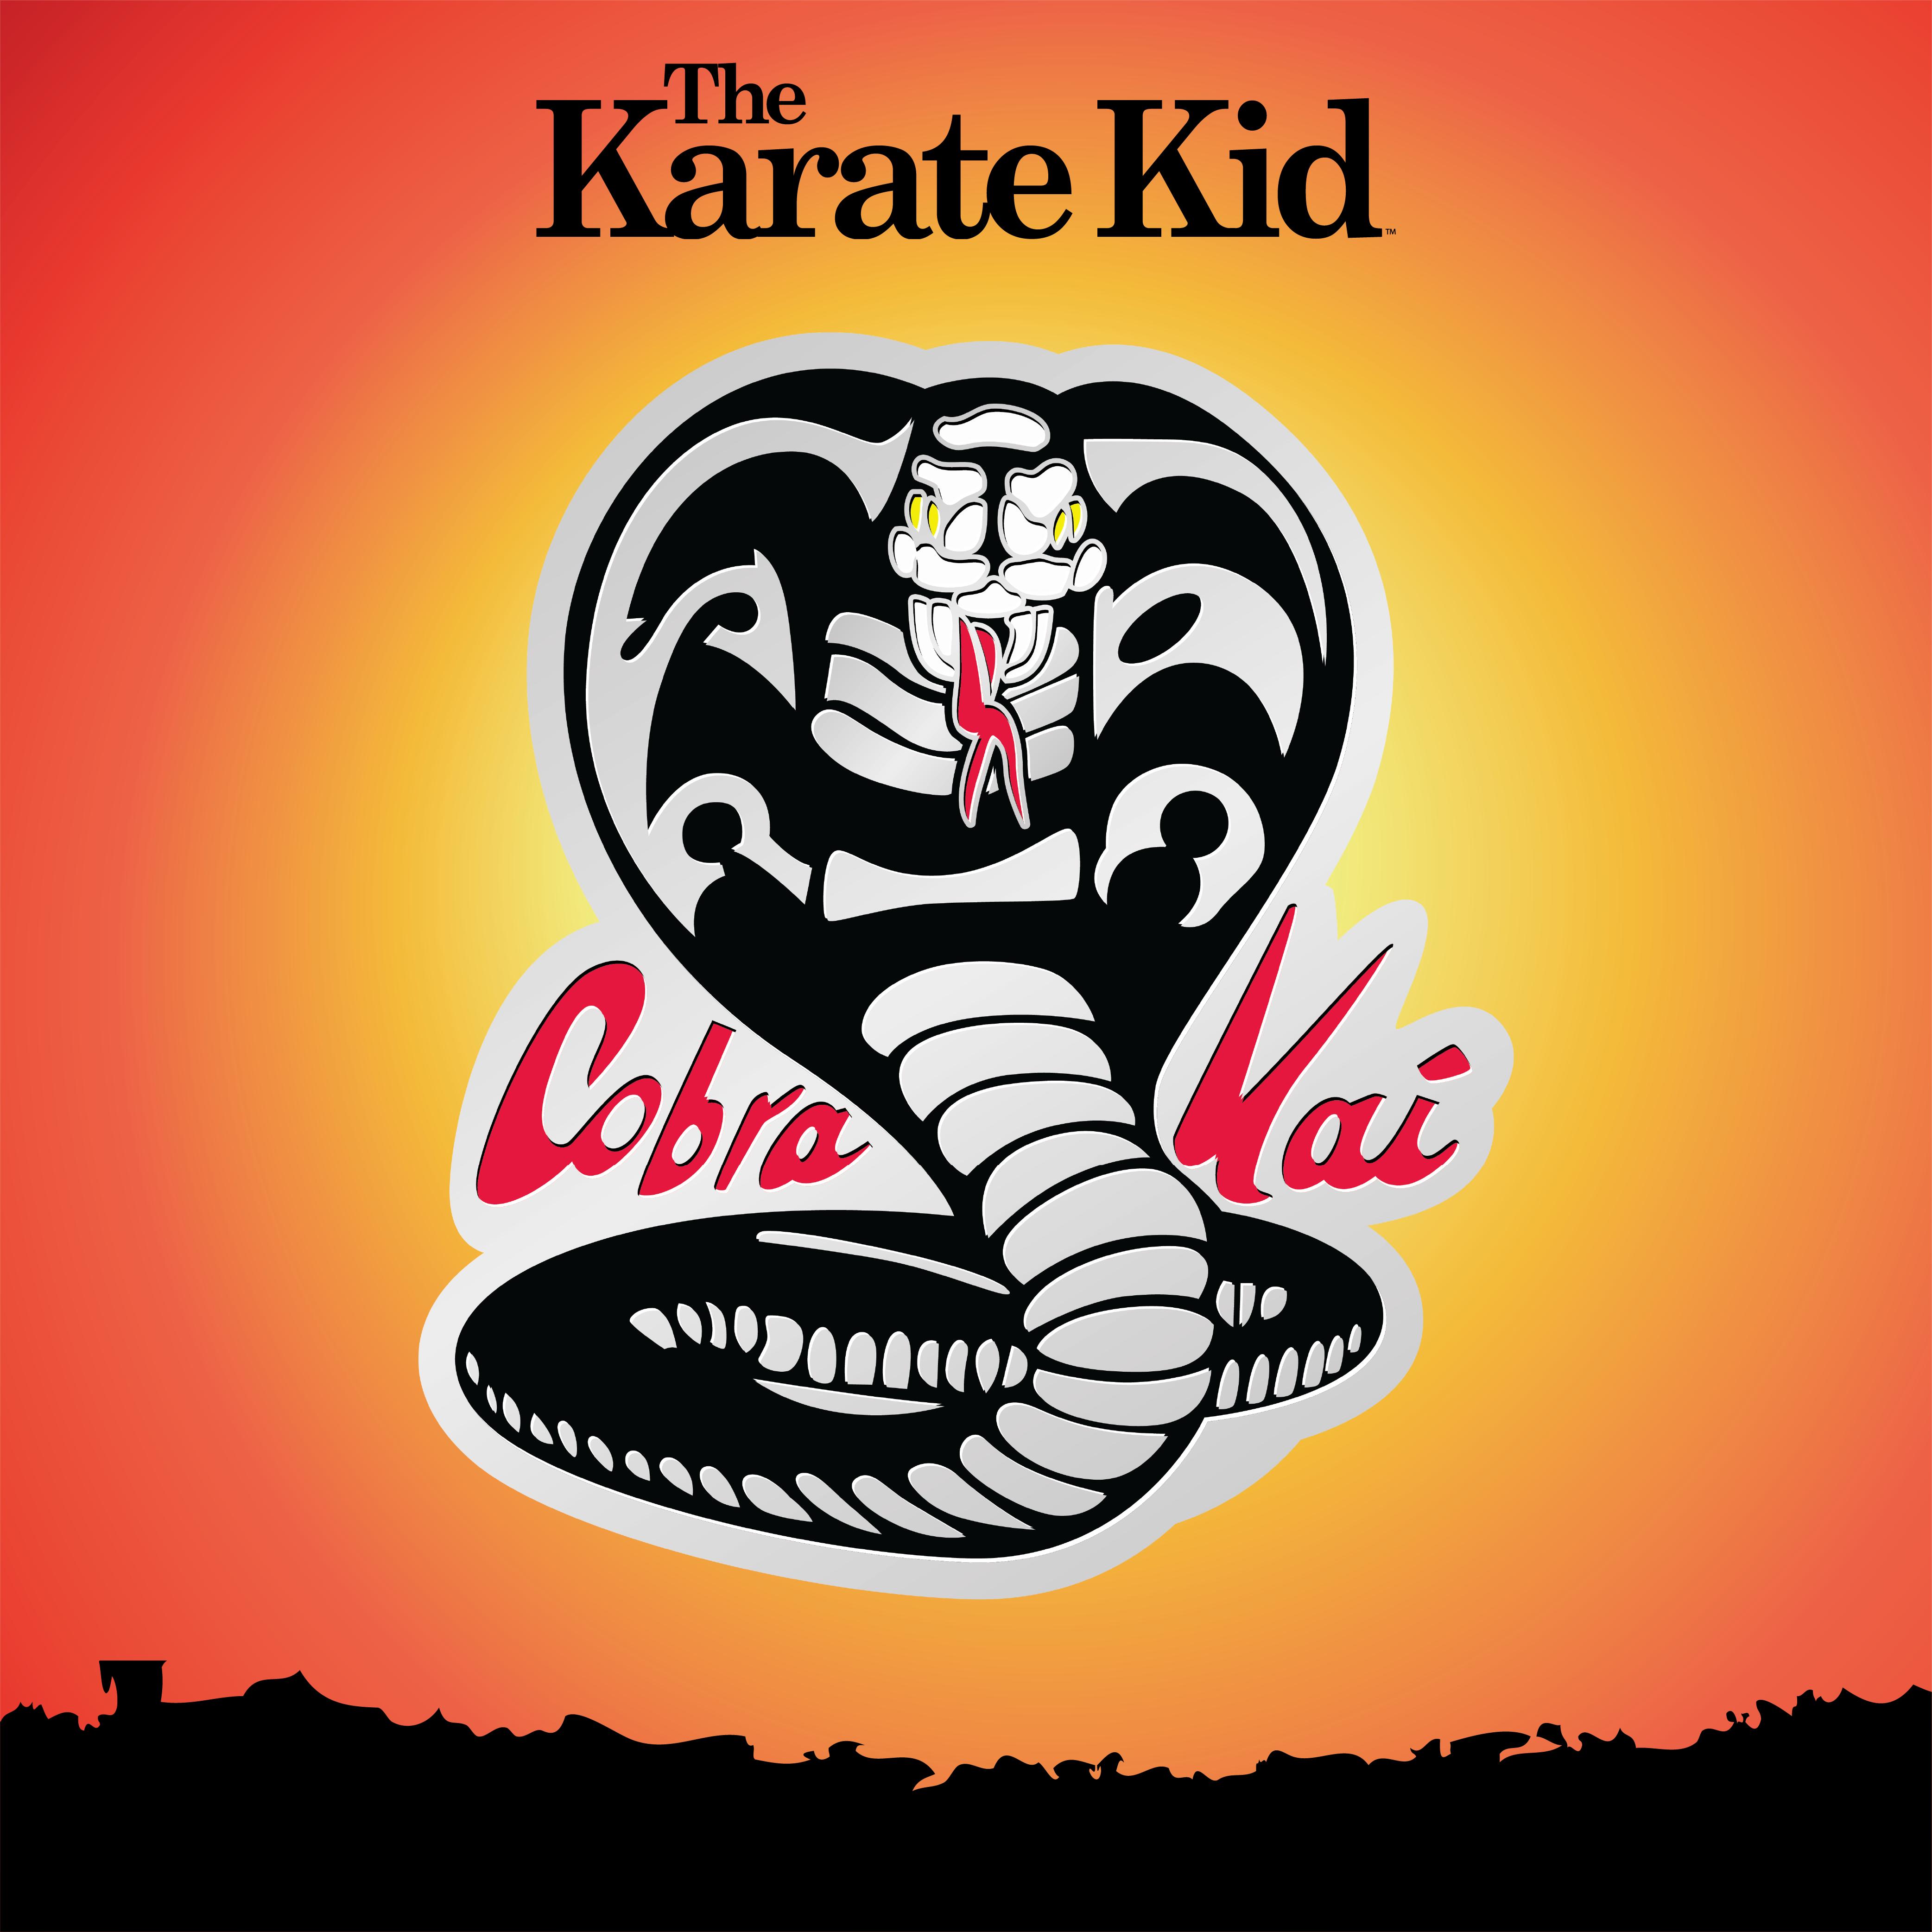 The Karate Kid Cobra Kai Logo Enamel Pin Silver Edition Exclusive In 2021 Kid Cobra Karate Kid Cobra Kai Karate Kid